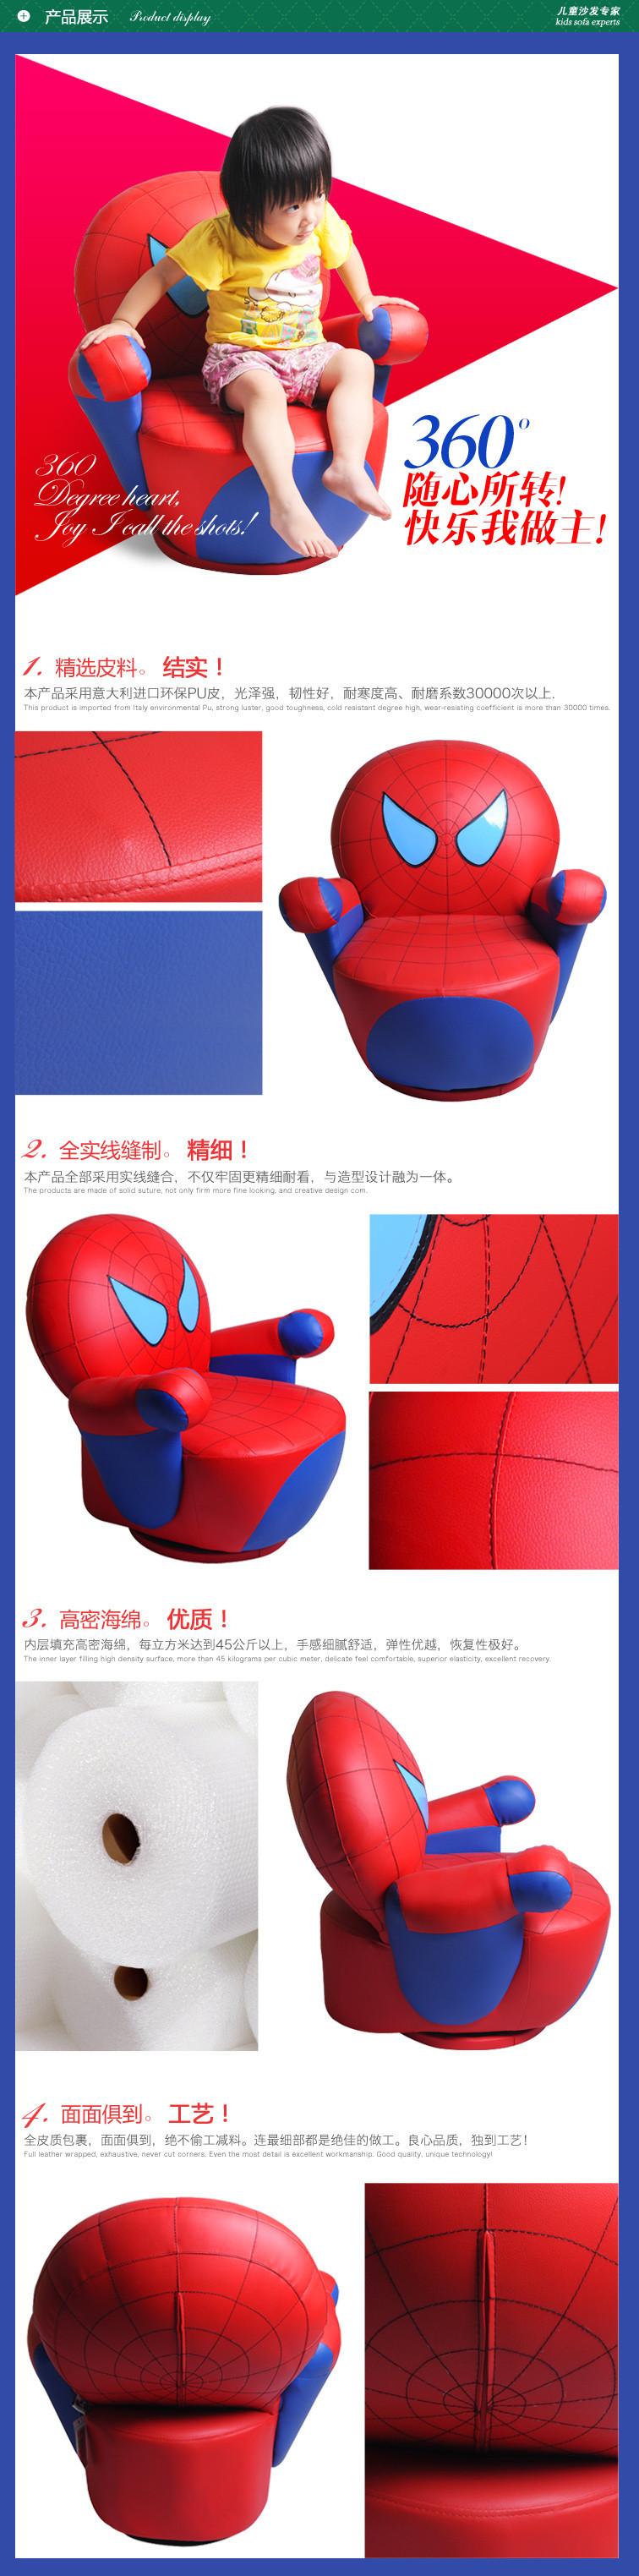 Strange 2019 Children Cartoon Superman Spider Man Sofa Swivel Simple And Modern Living Room Sofa Ems From Anna6789 1105 53 Dhgate Com Evergreenethics Interior Chair Design Evergreenethicsorg